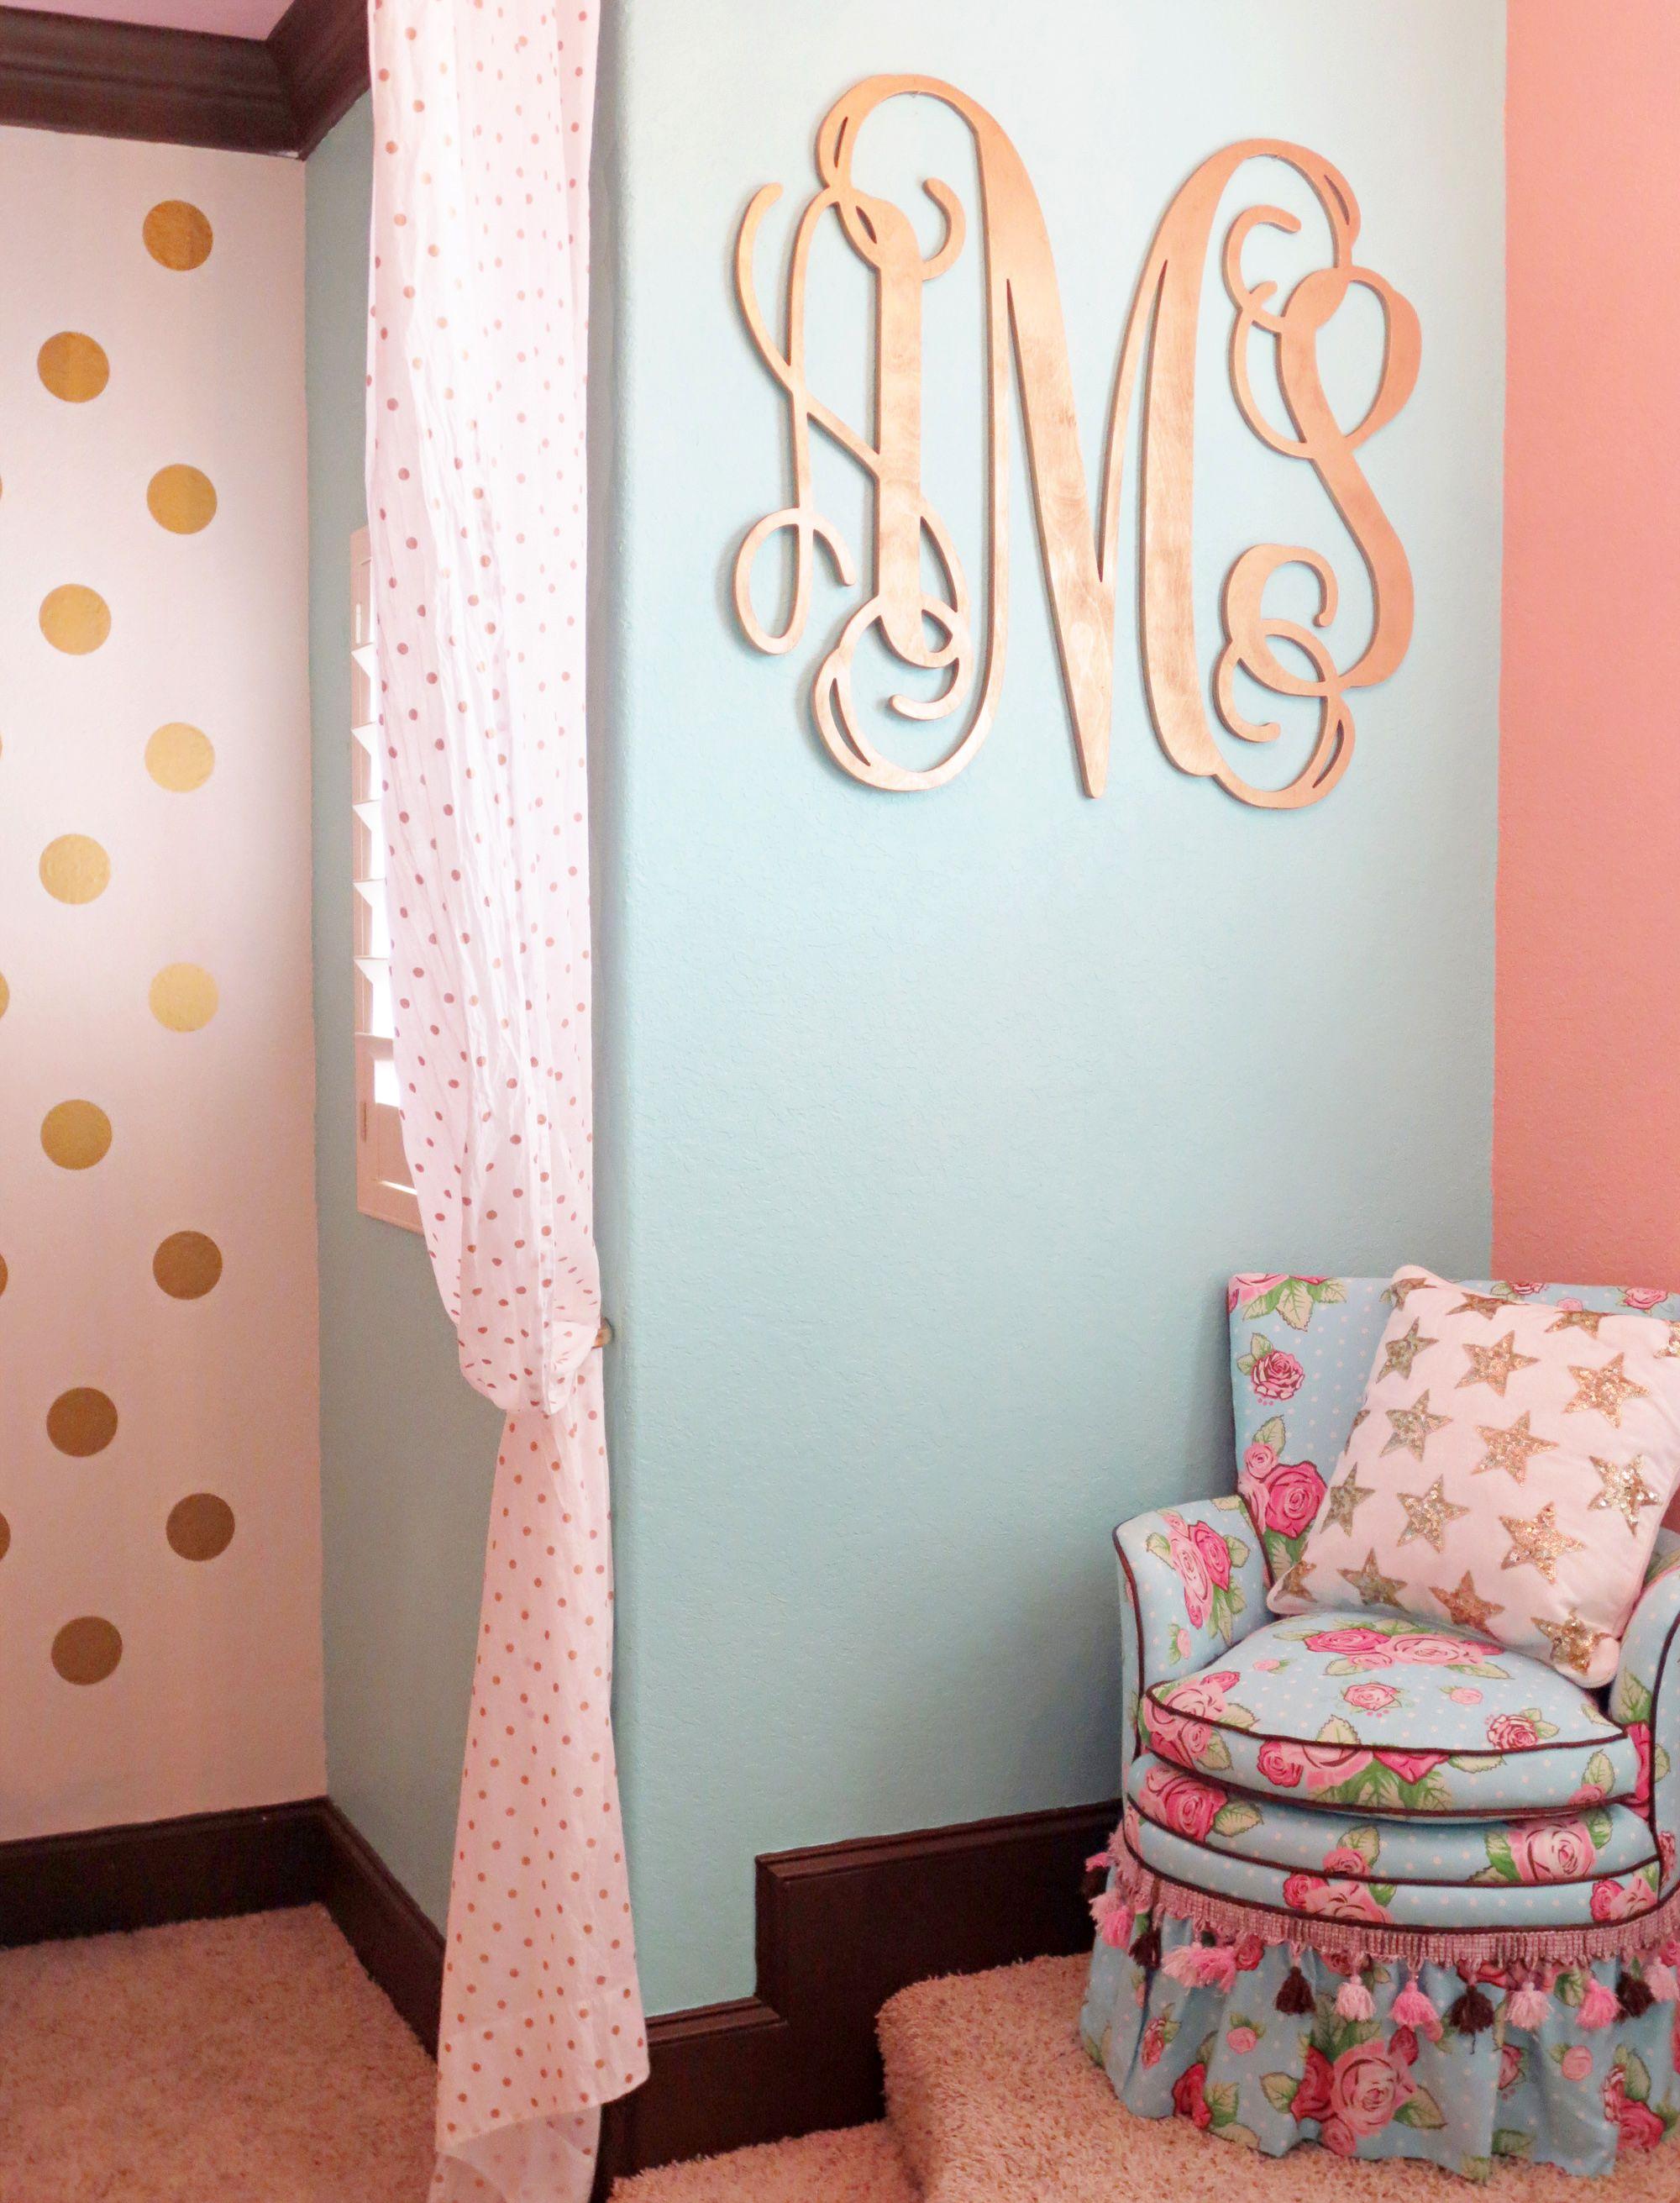 Katy Mimari S Glam Big Girl Room Project Nursery Little Girl Rooms Girl Room Big Girl Rooms